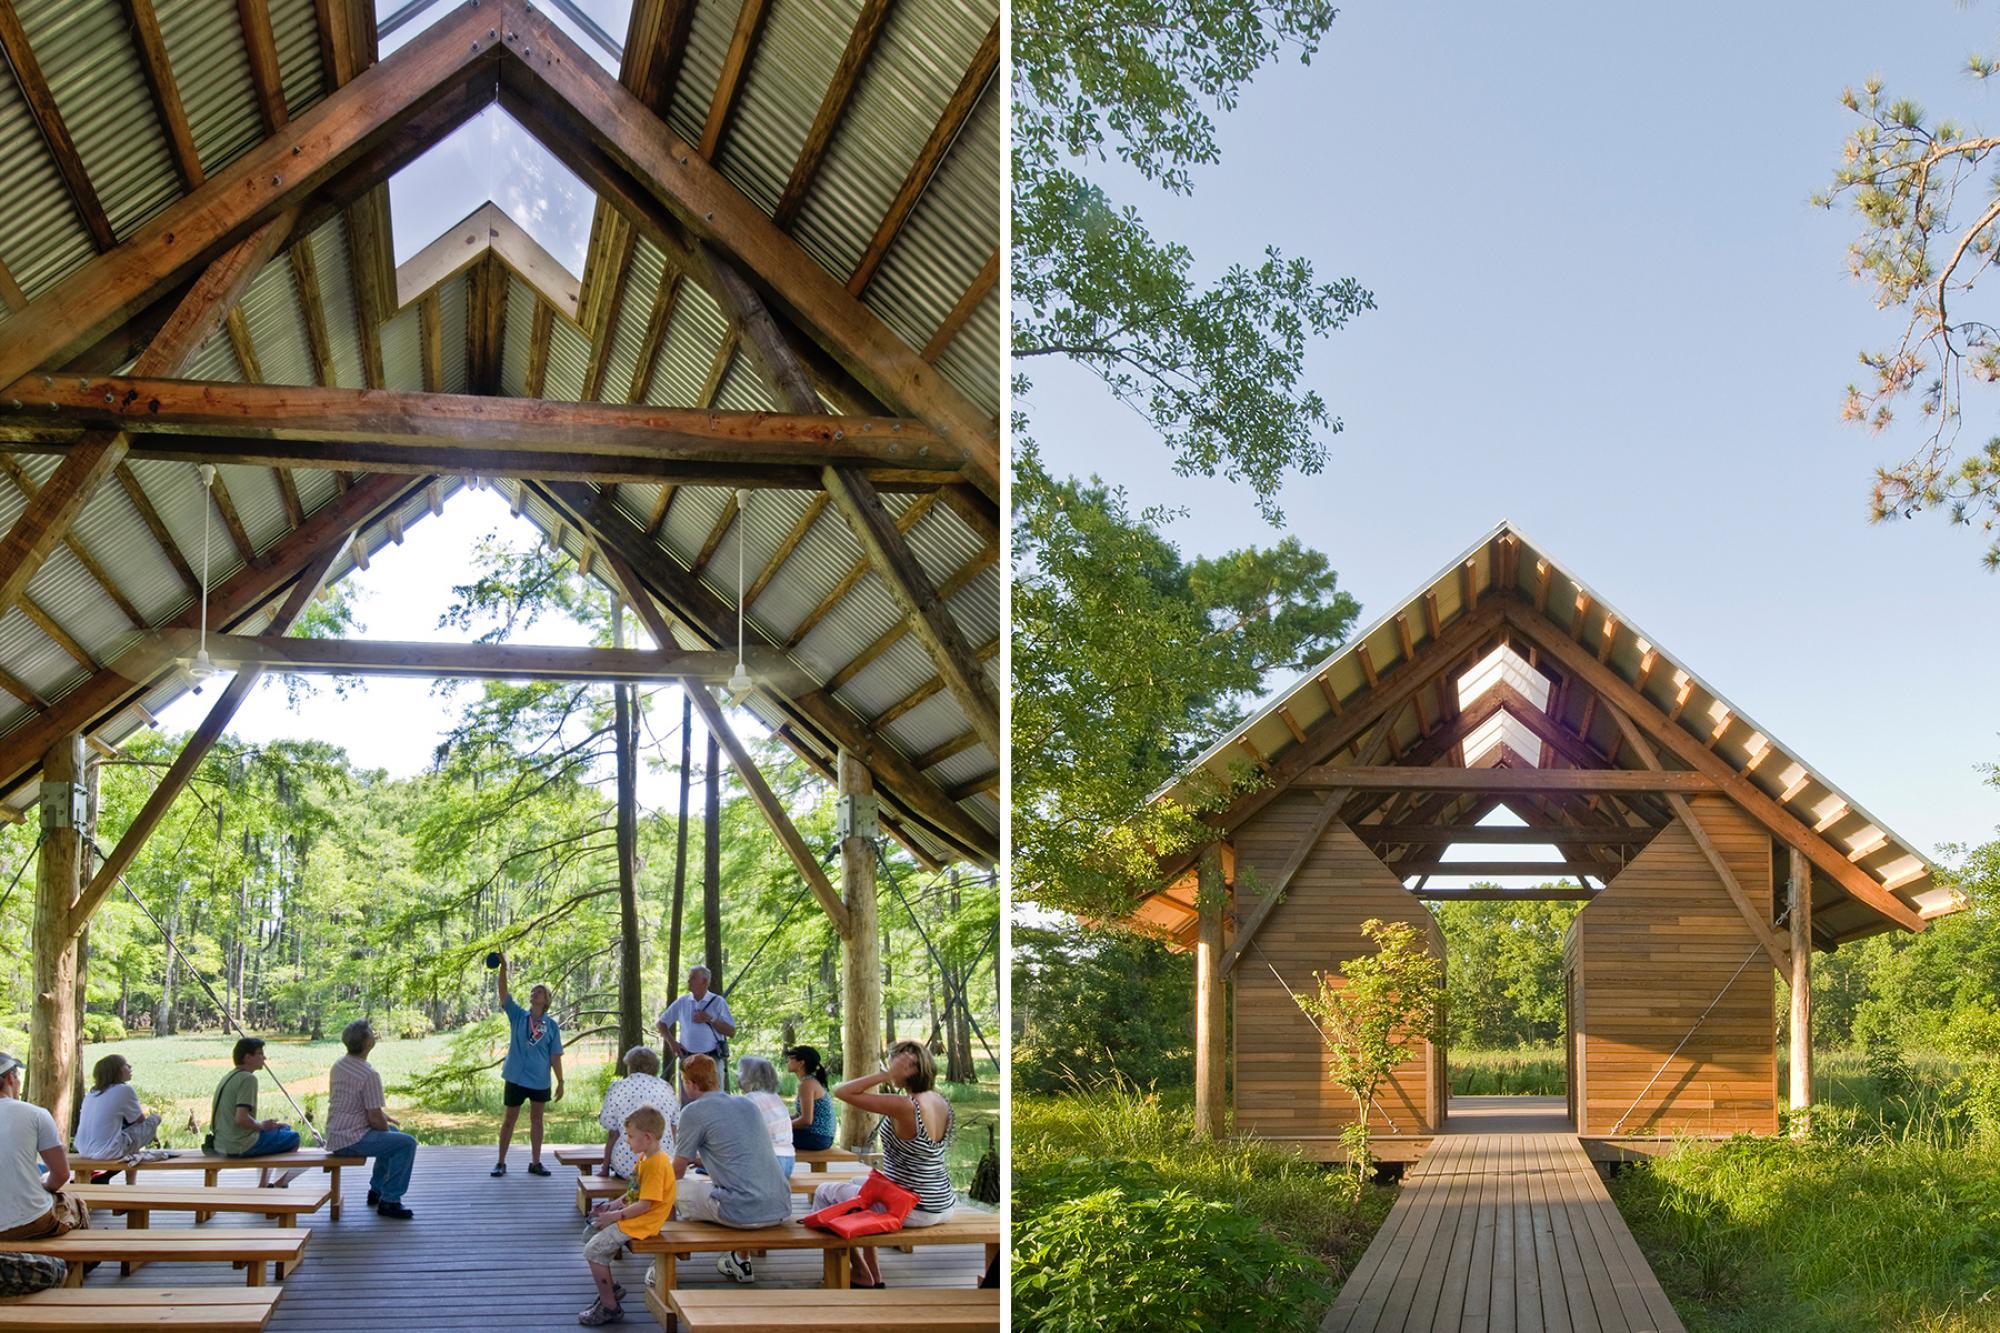 Shangri La Nature Center Lake Flato